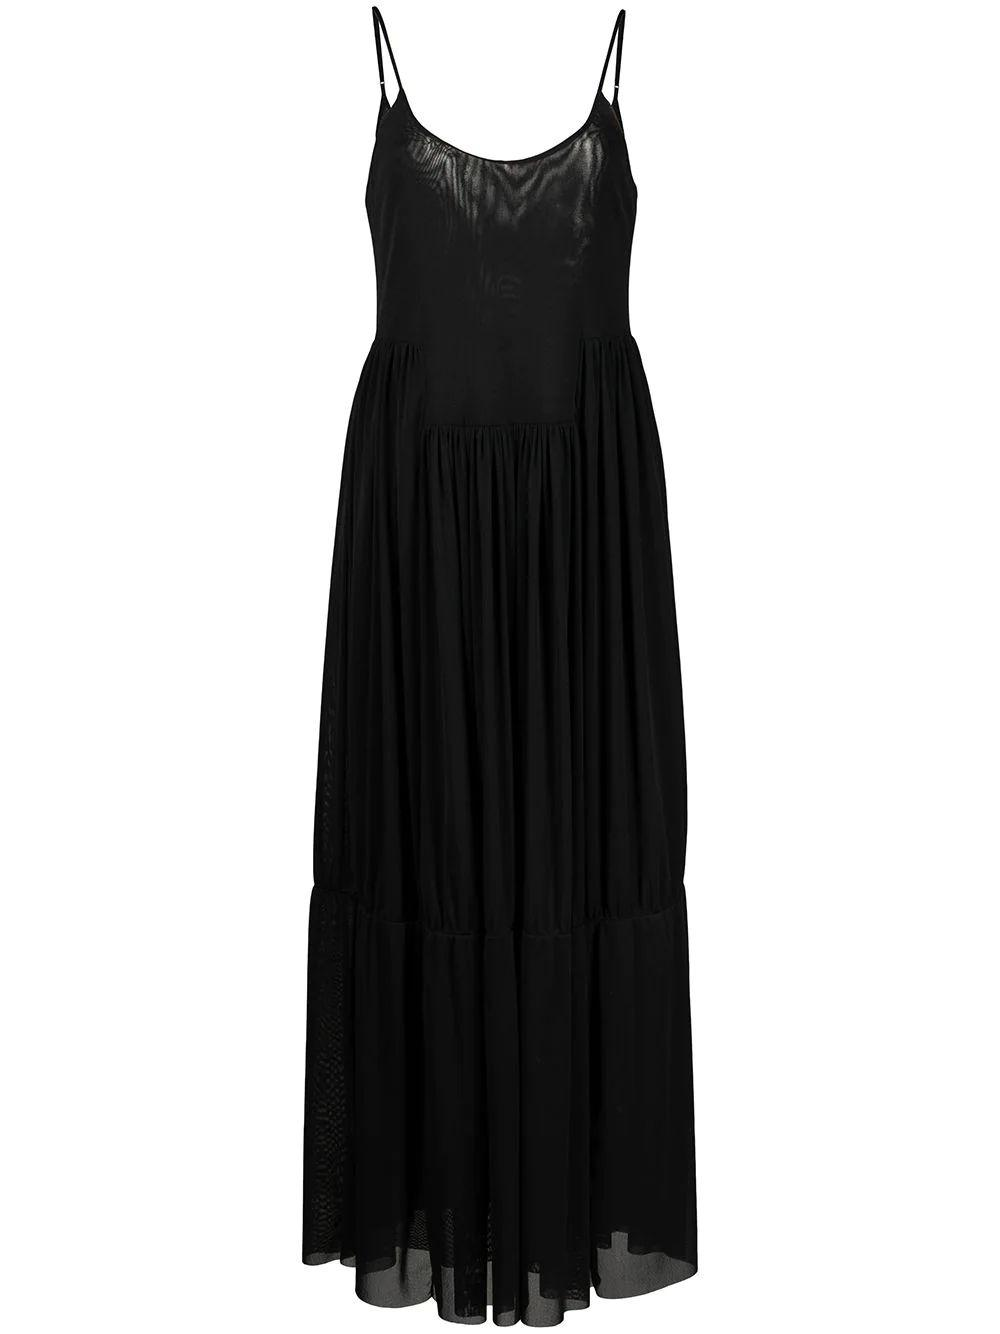 Gathered Cami Maxi Dress Item # V7535-83471